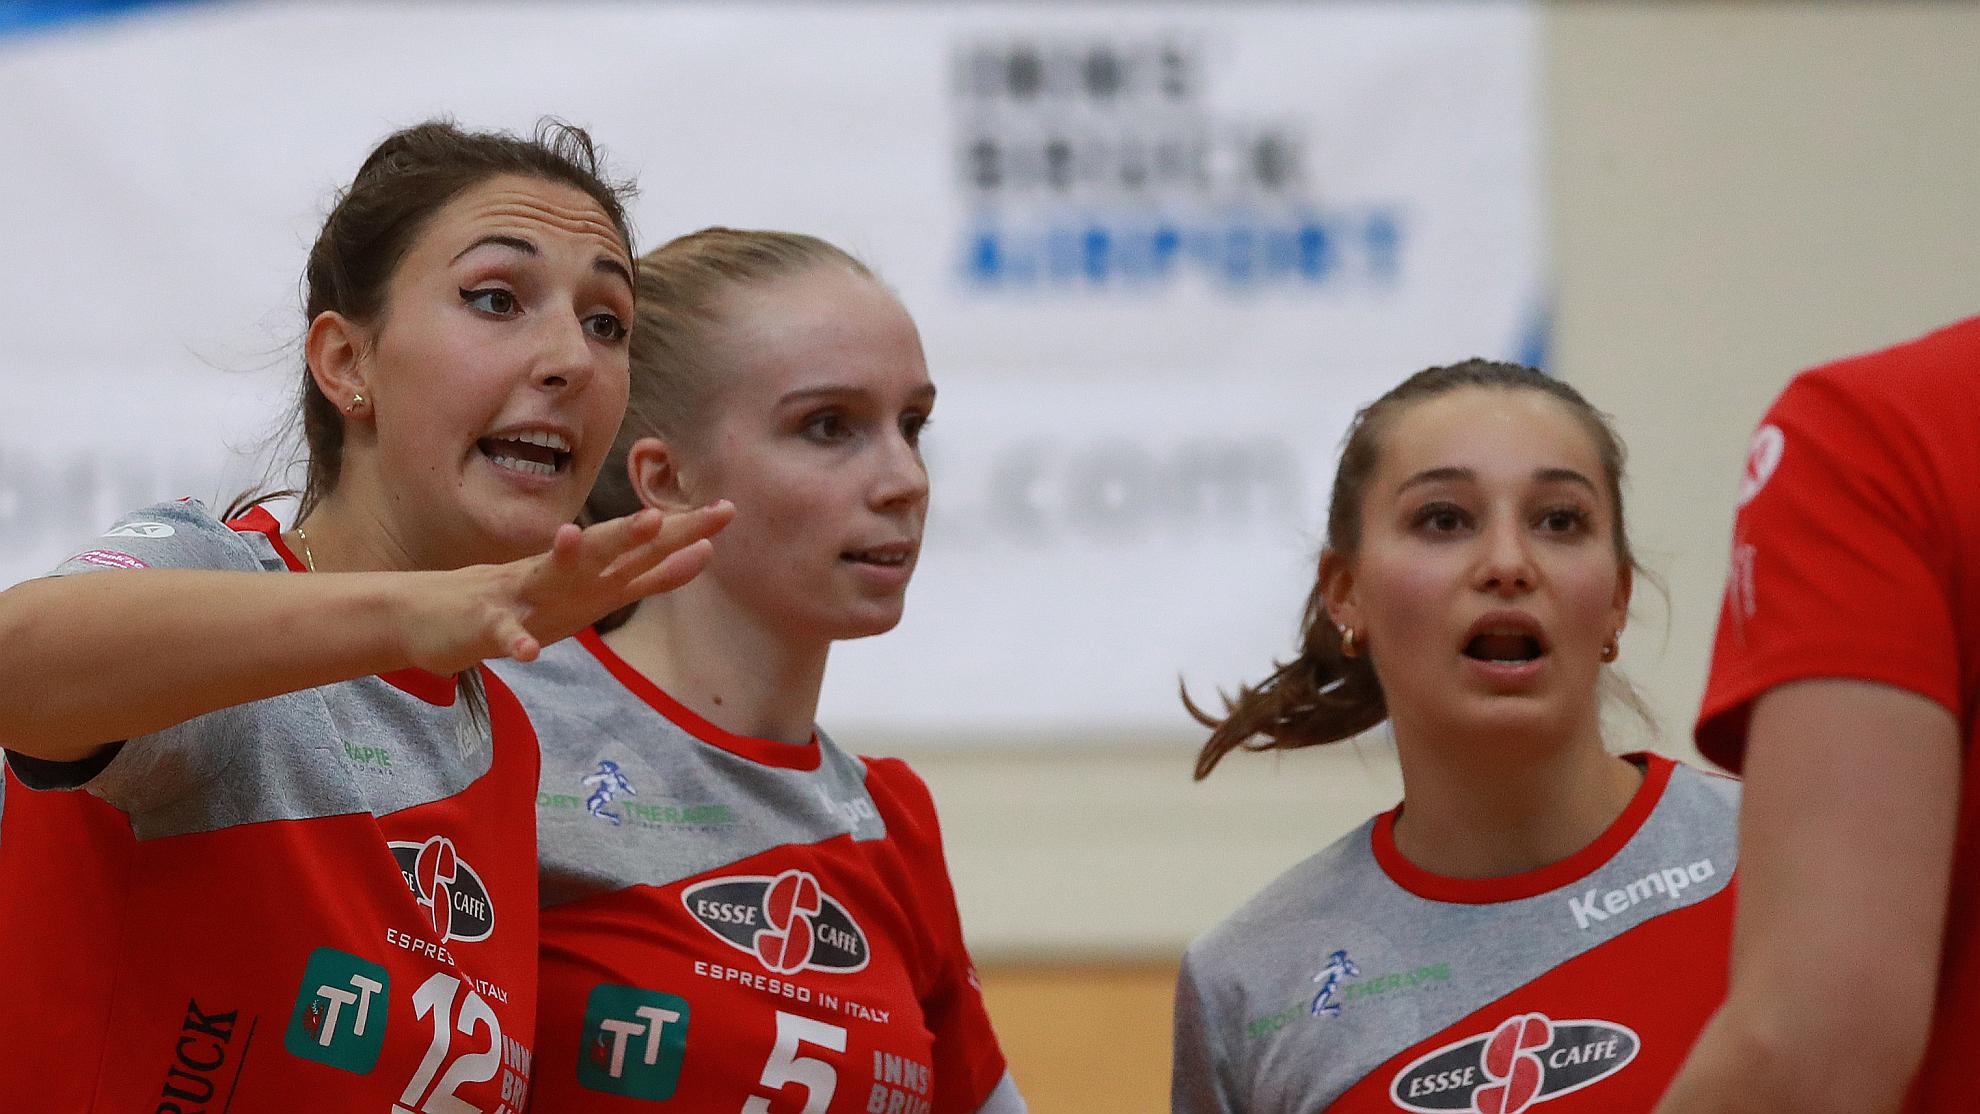 TI-esssecaffè-volley 2019 - FOTO © GEPA pictures/Andreas Pranter